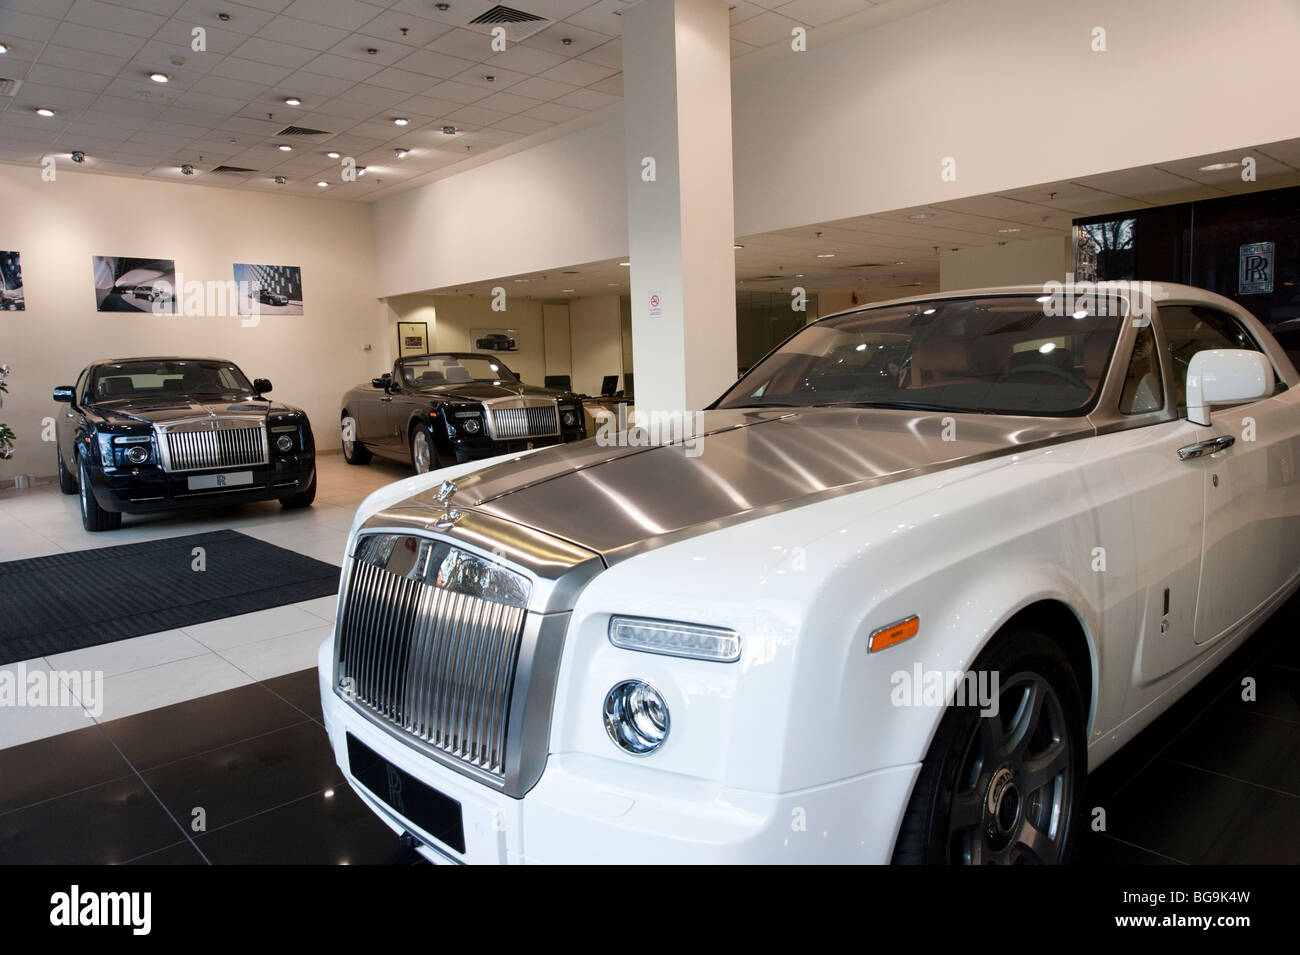 Rolls Royce car showroom, Mayfair, London, UK - Stock Image